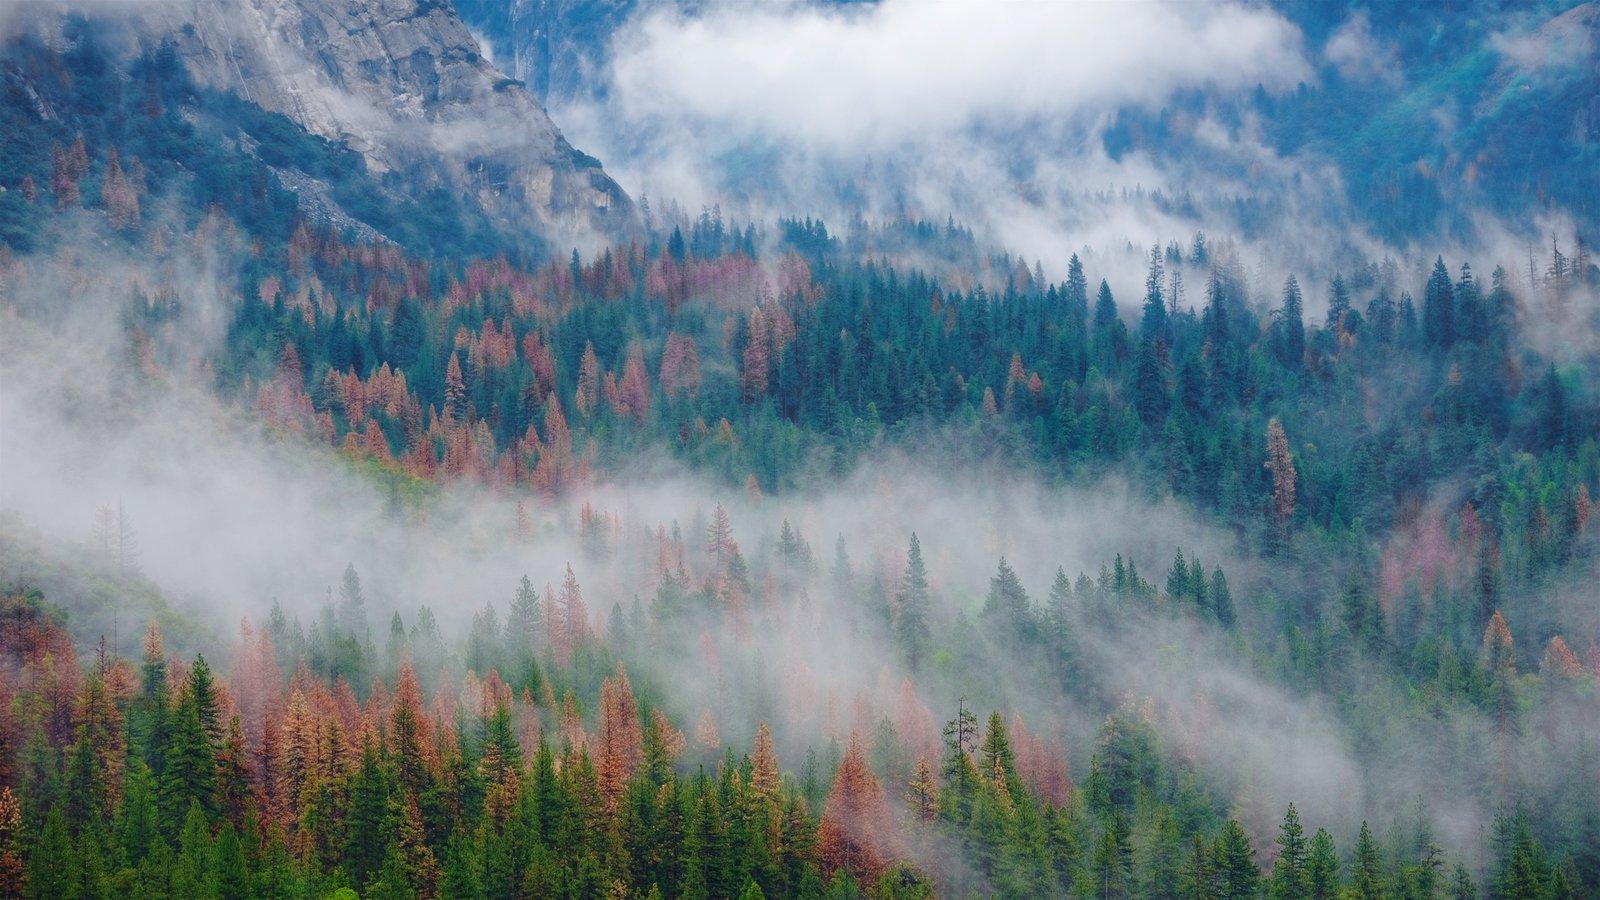 Tunnel View mostrando florestas e neblina